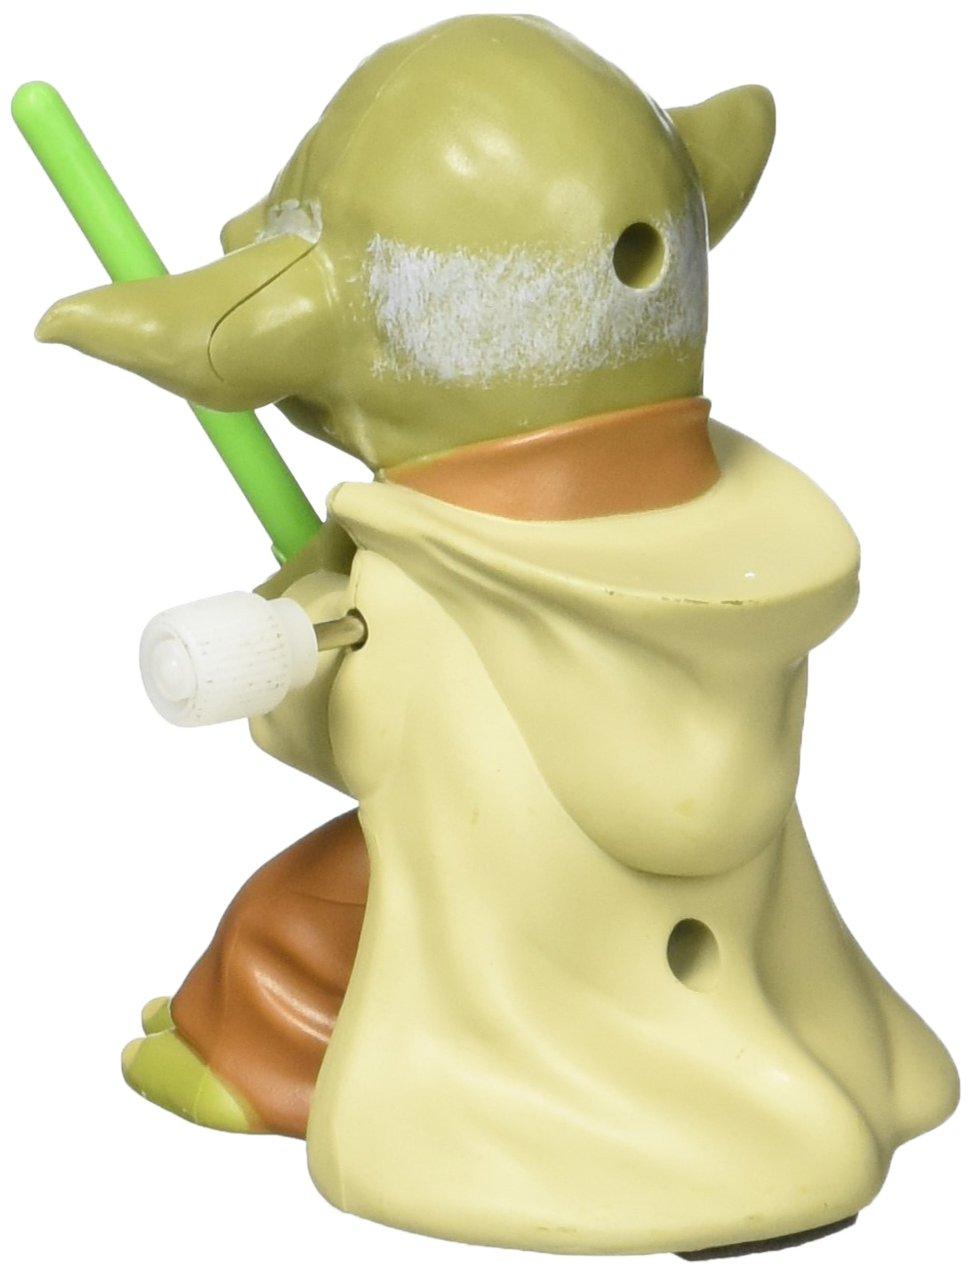 Star Wars Disney Yoda Wind-up Flipping Toy by Star Wars (Image #2)